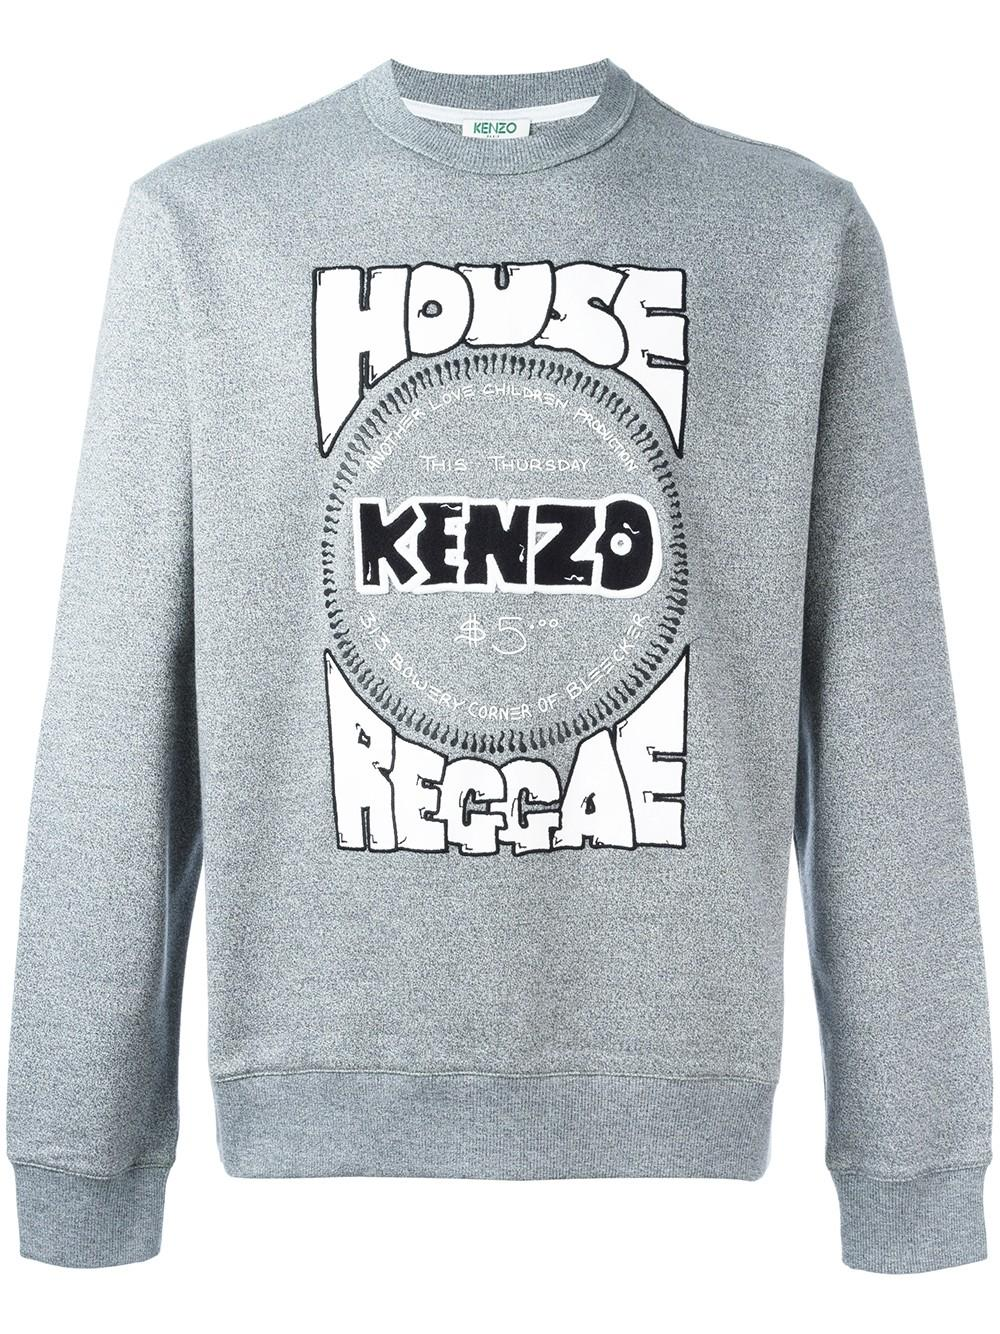 52f1540bb7 Lyst - KENZO House Reggae Print Sweatshirt in Gray for Men